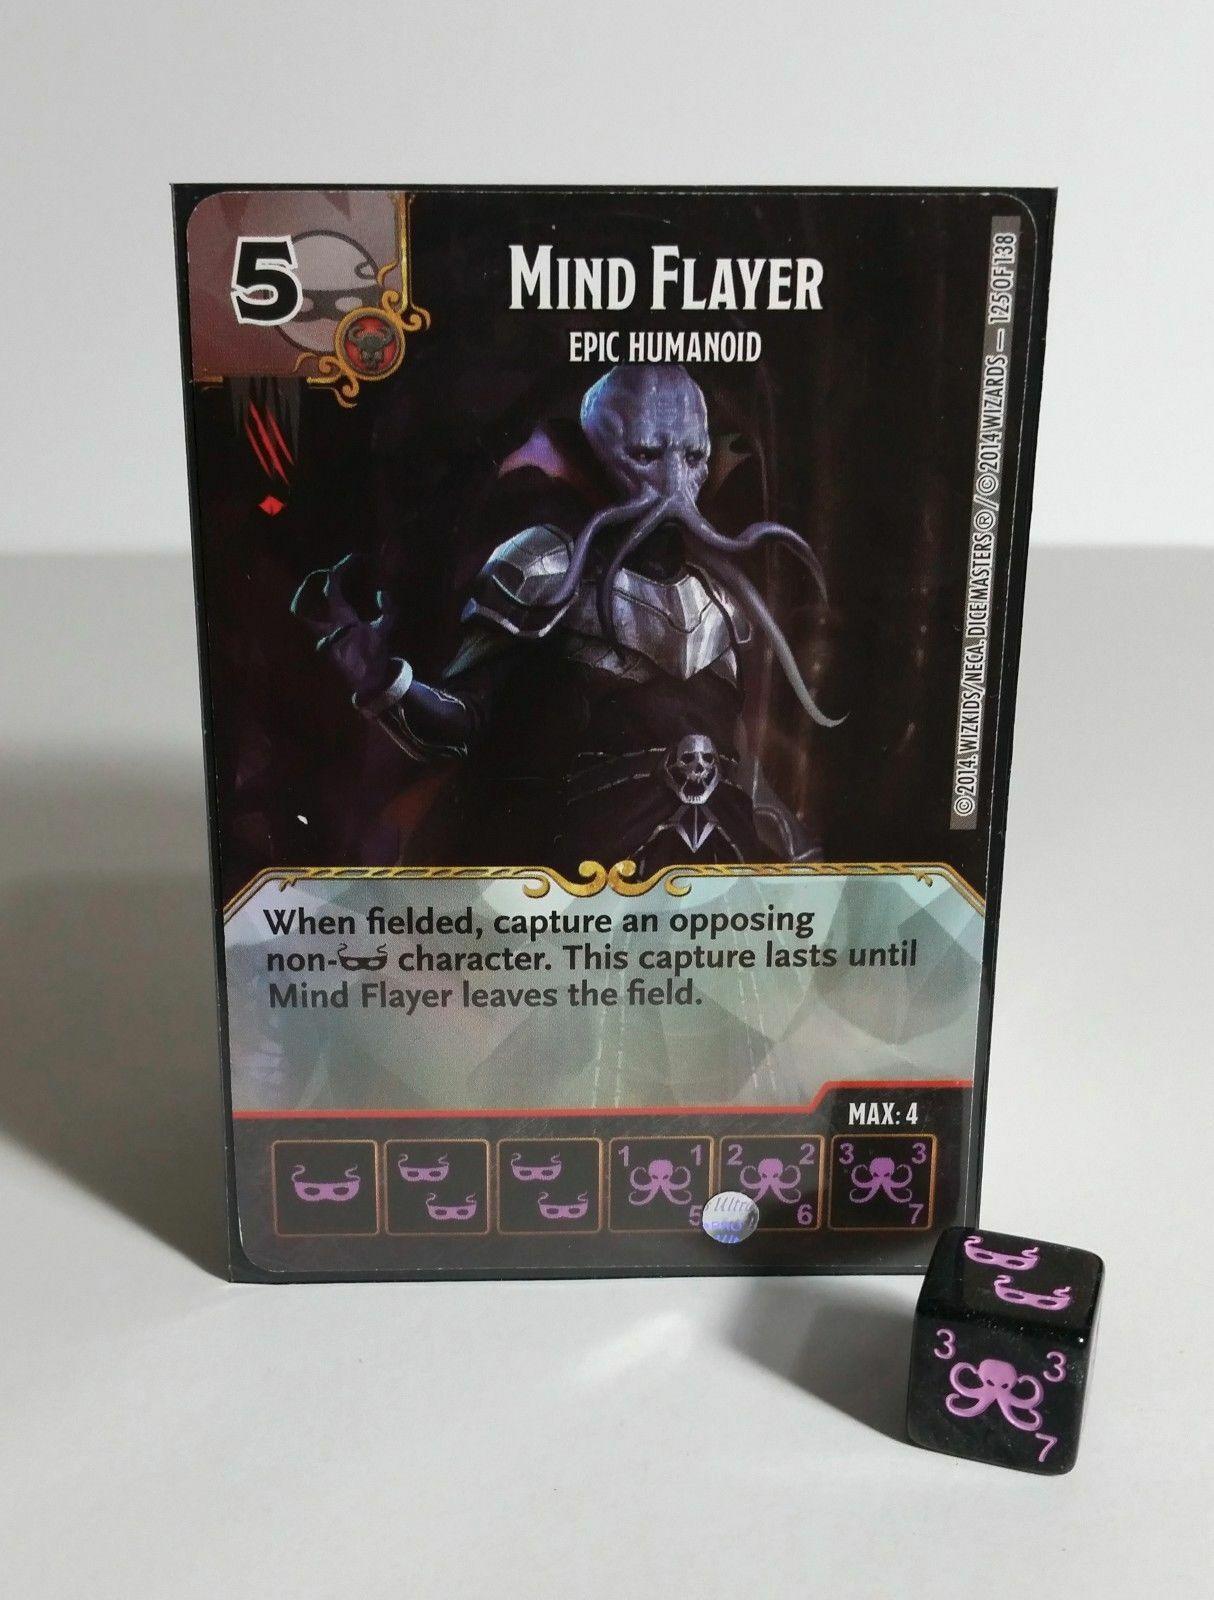 Mind Flayer Super Rare Epic Humanoid Battle for Faerun Dice Masters D&D